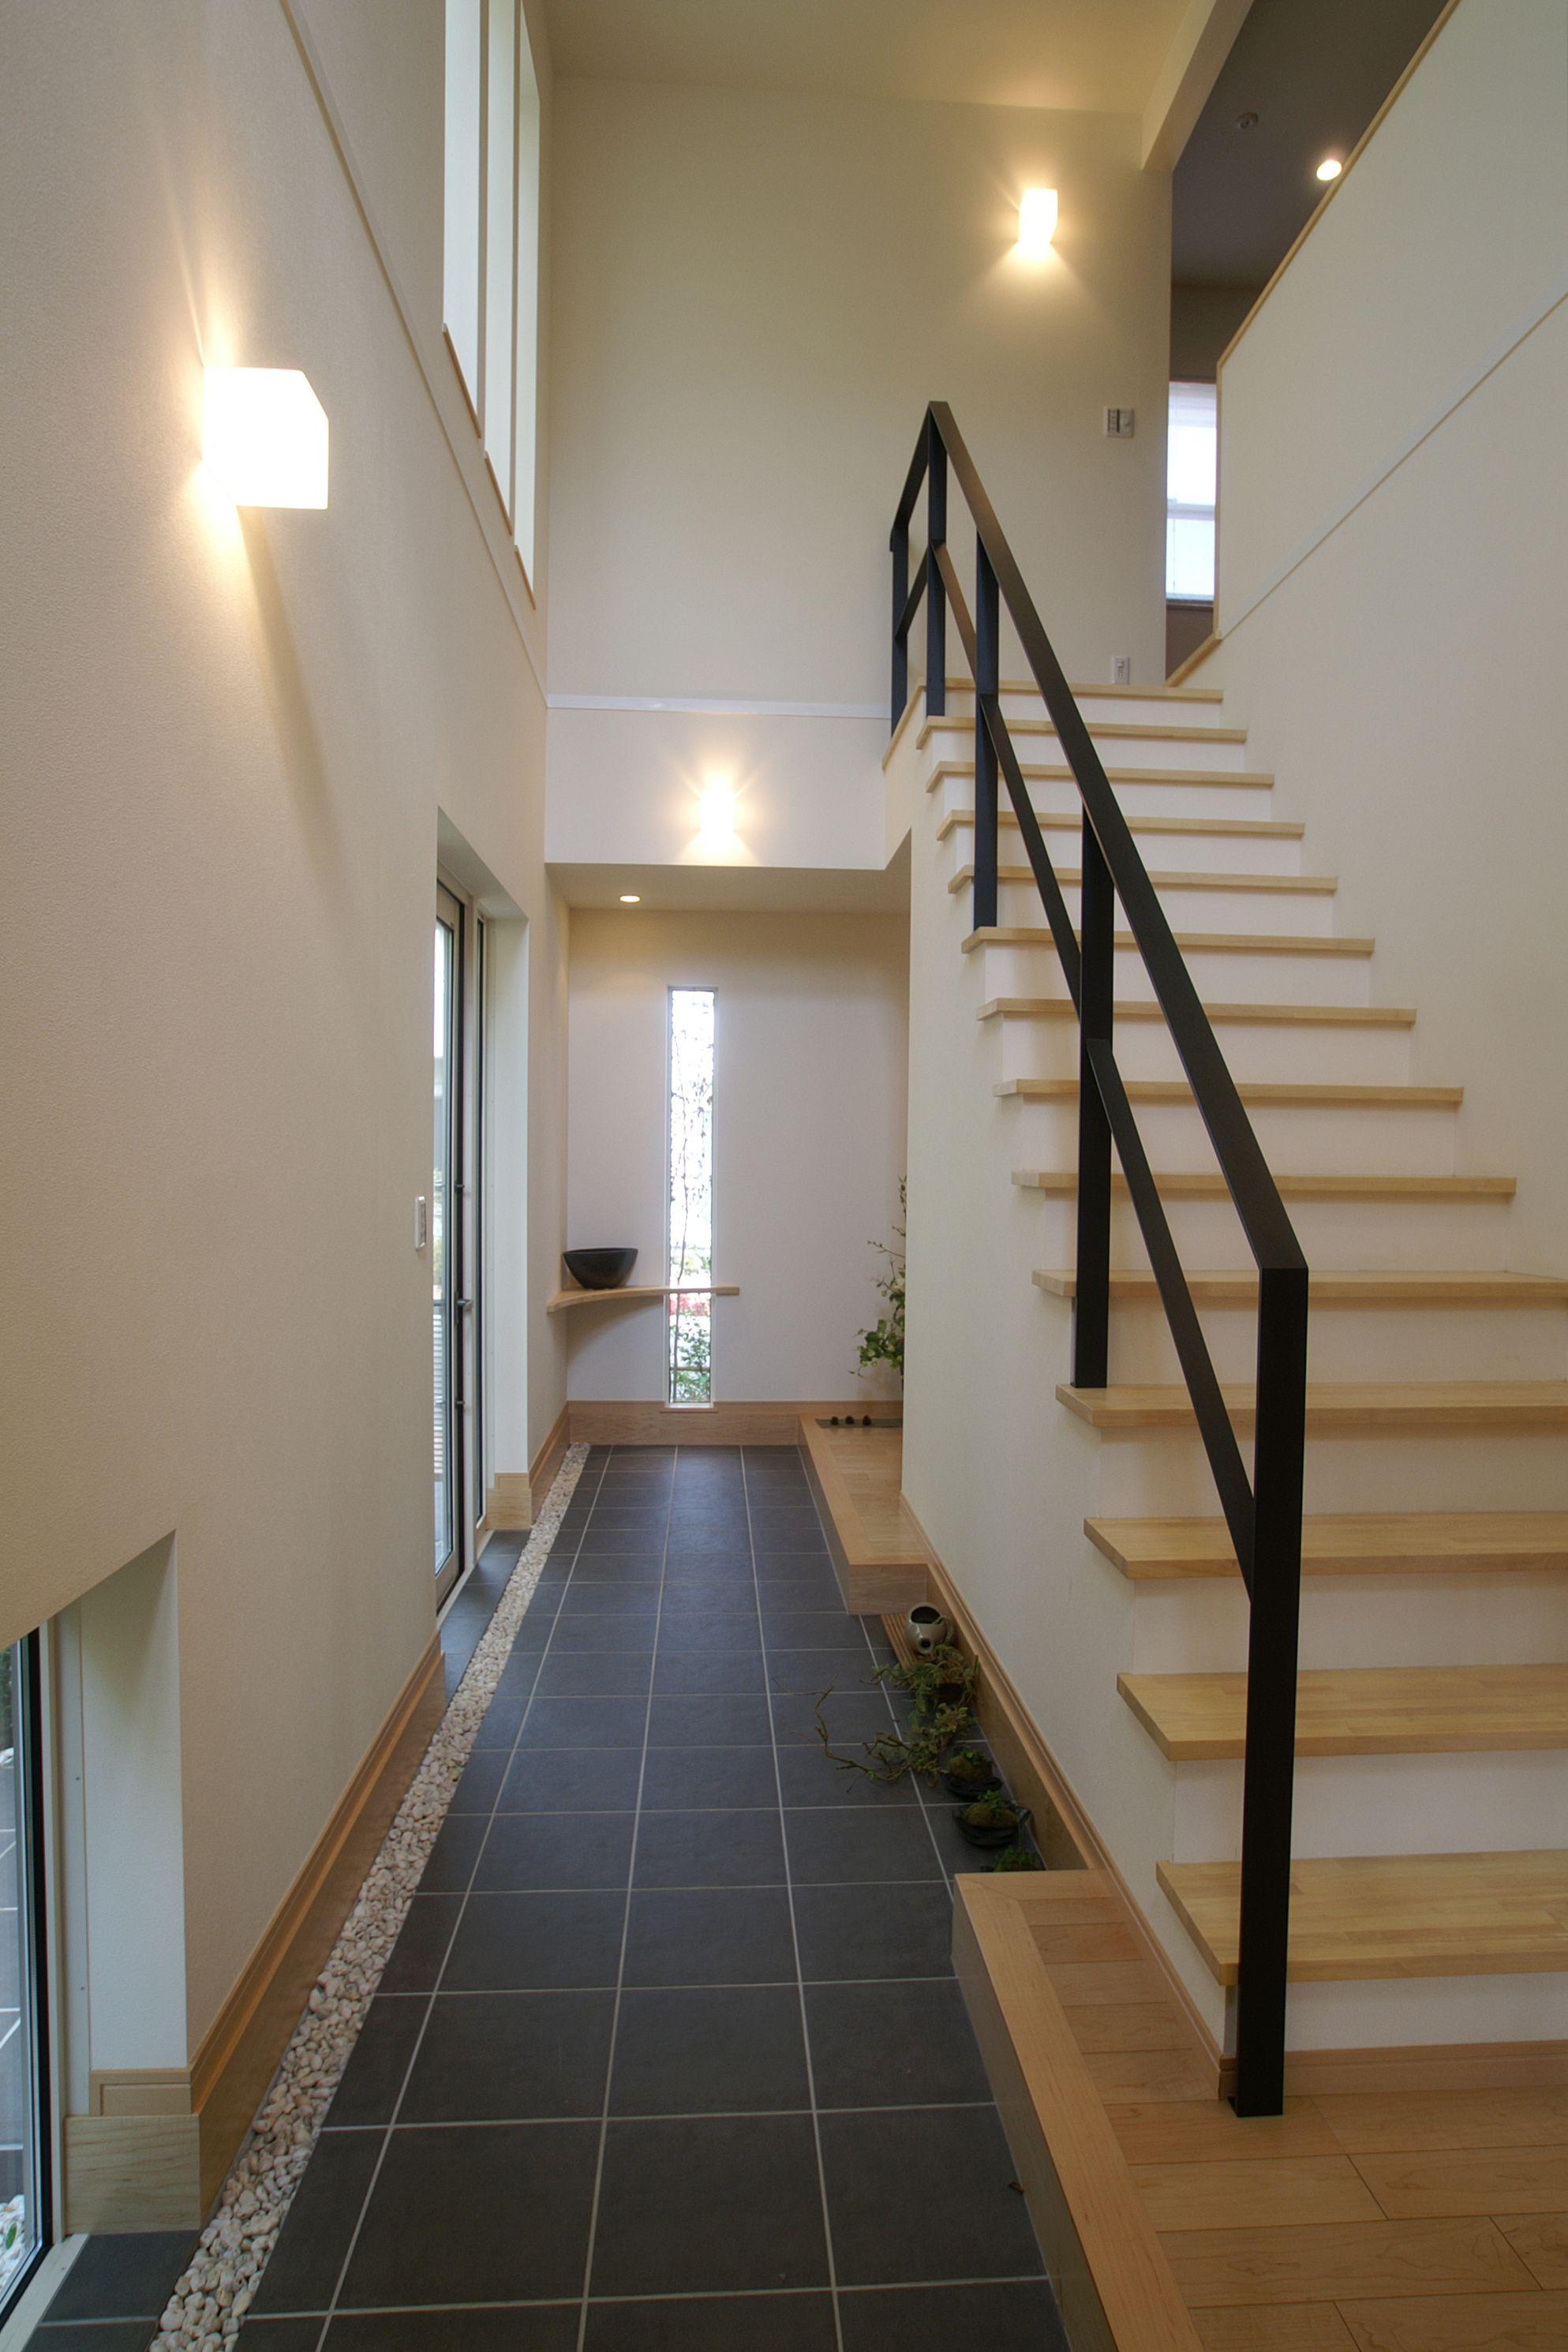 Totate Housing L Entrancehall 開放的な土間のある玄関ホール